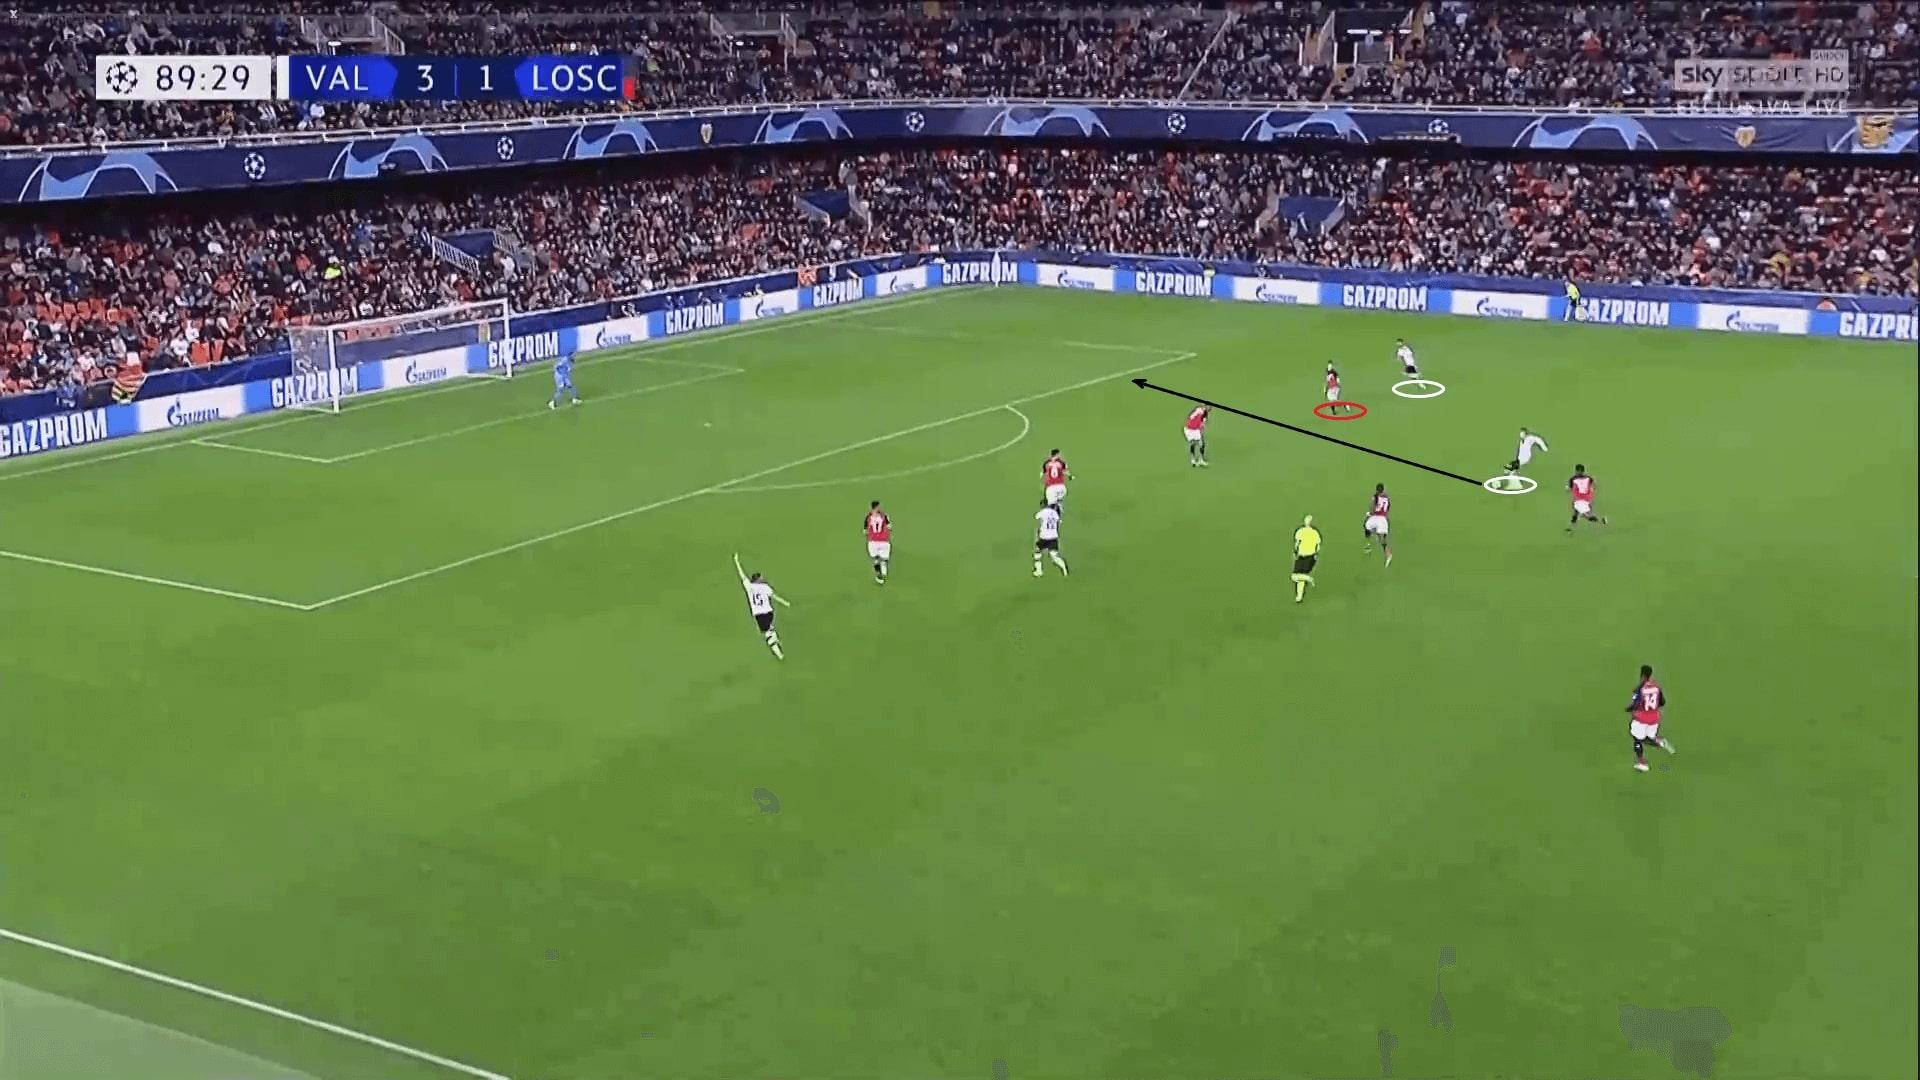 Ferran Torres at Manchester City 2020/21 - scout report - tactical analysis - tactics